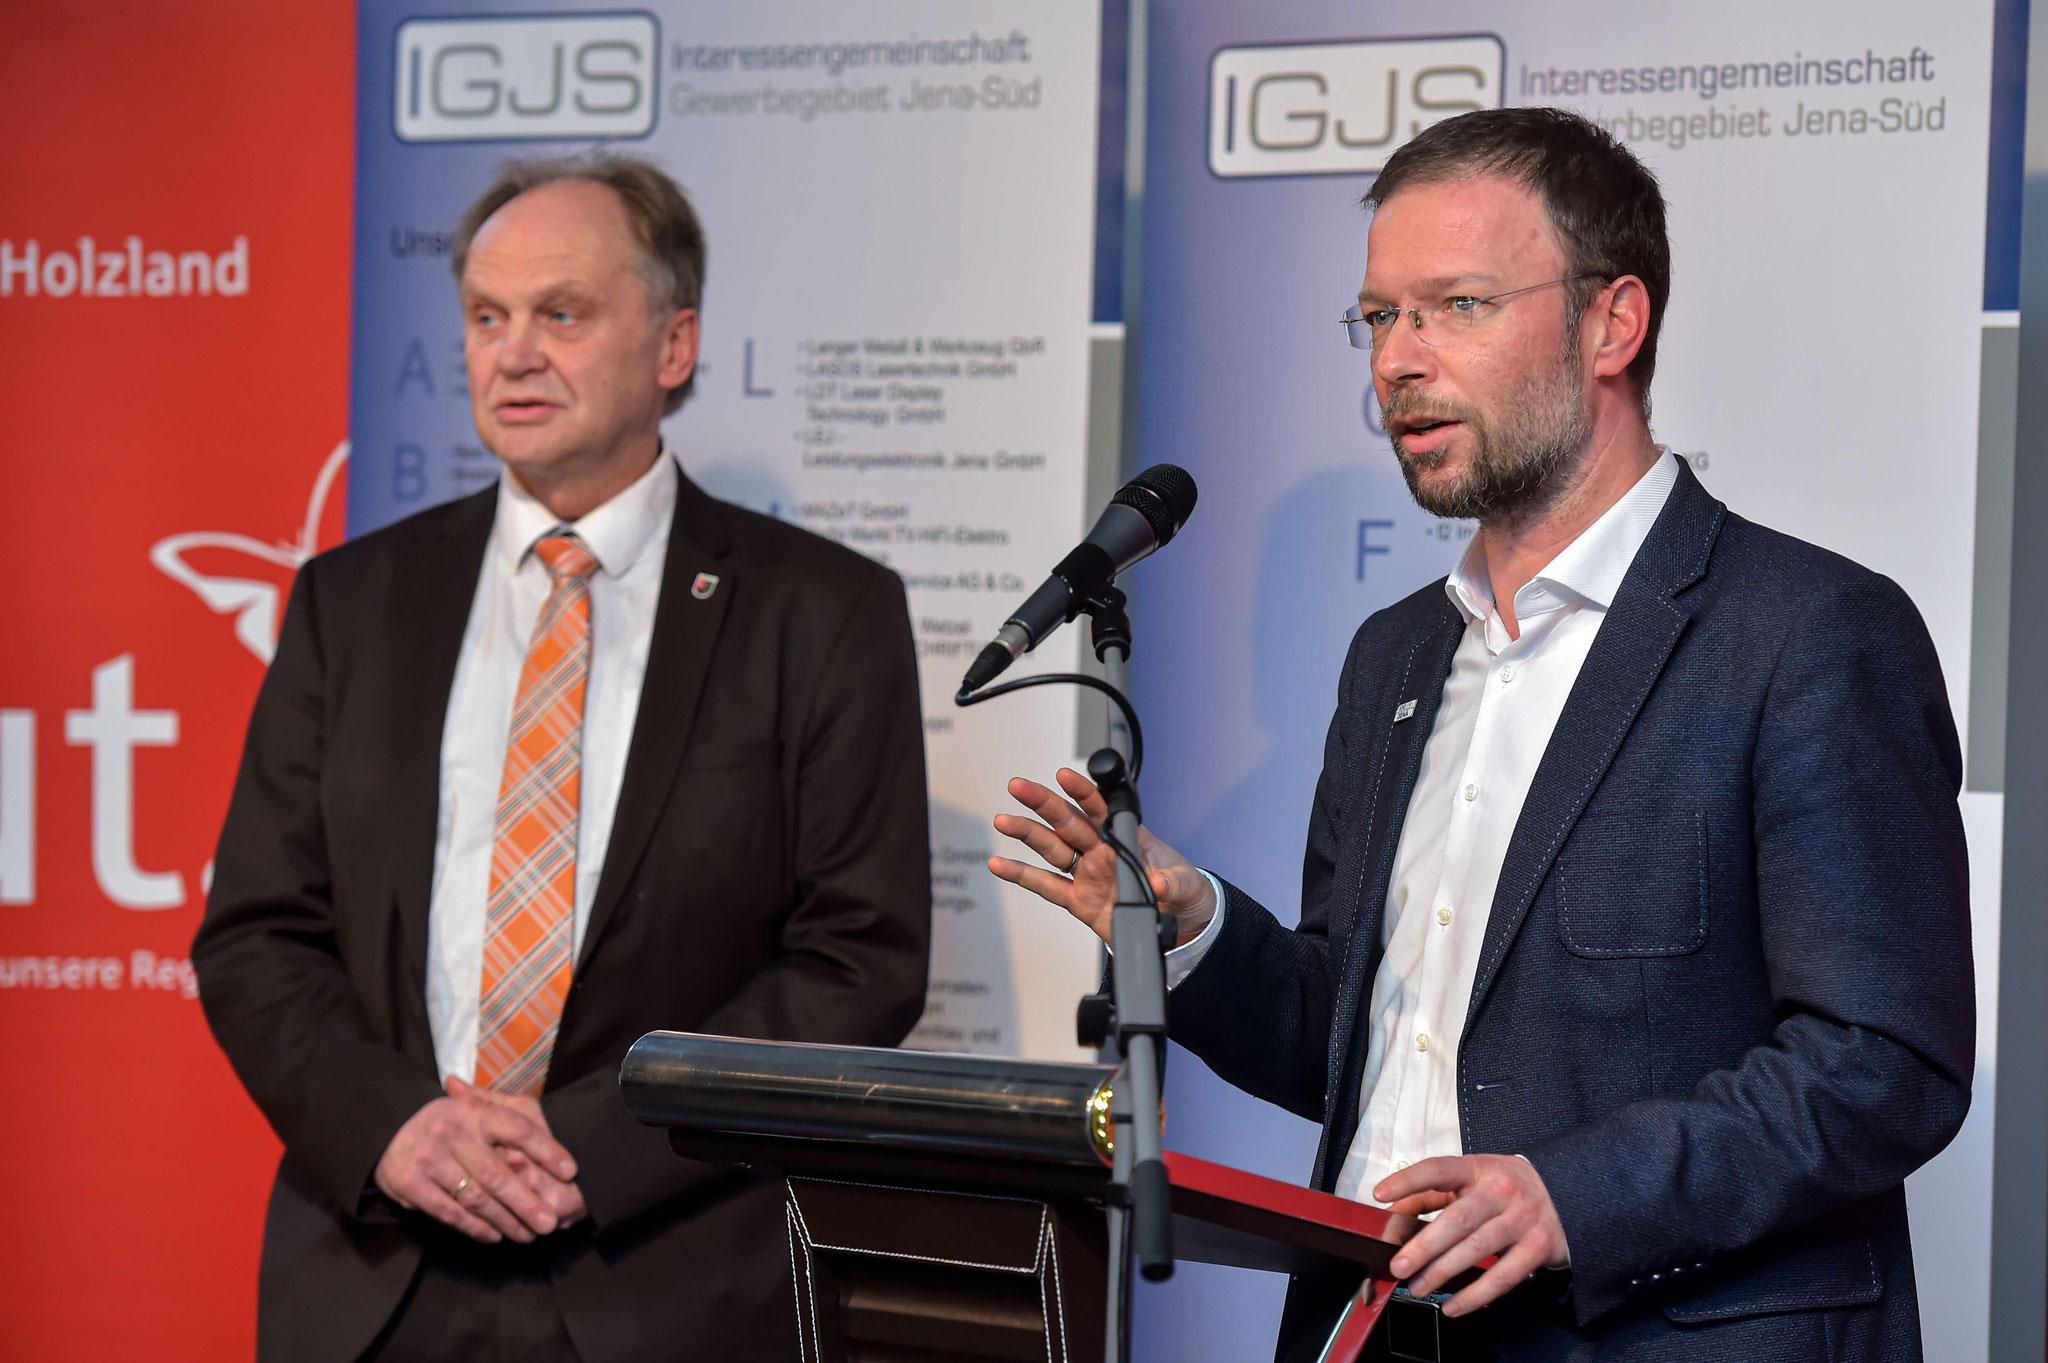 Ansprache Oberbürgermeister der Stadt Jena - Dr. Thomas Nitzsche